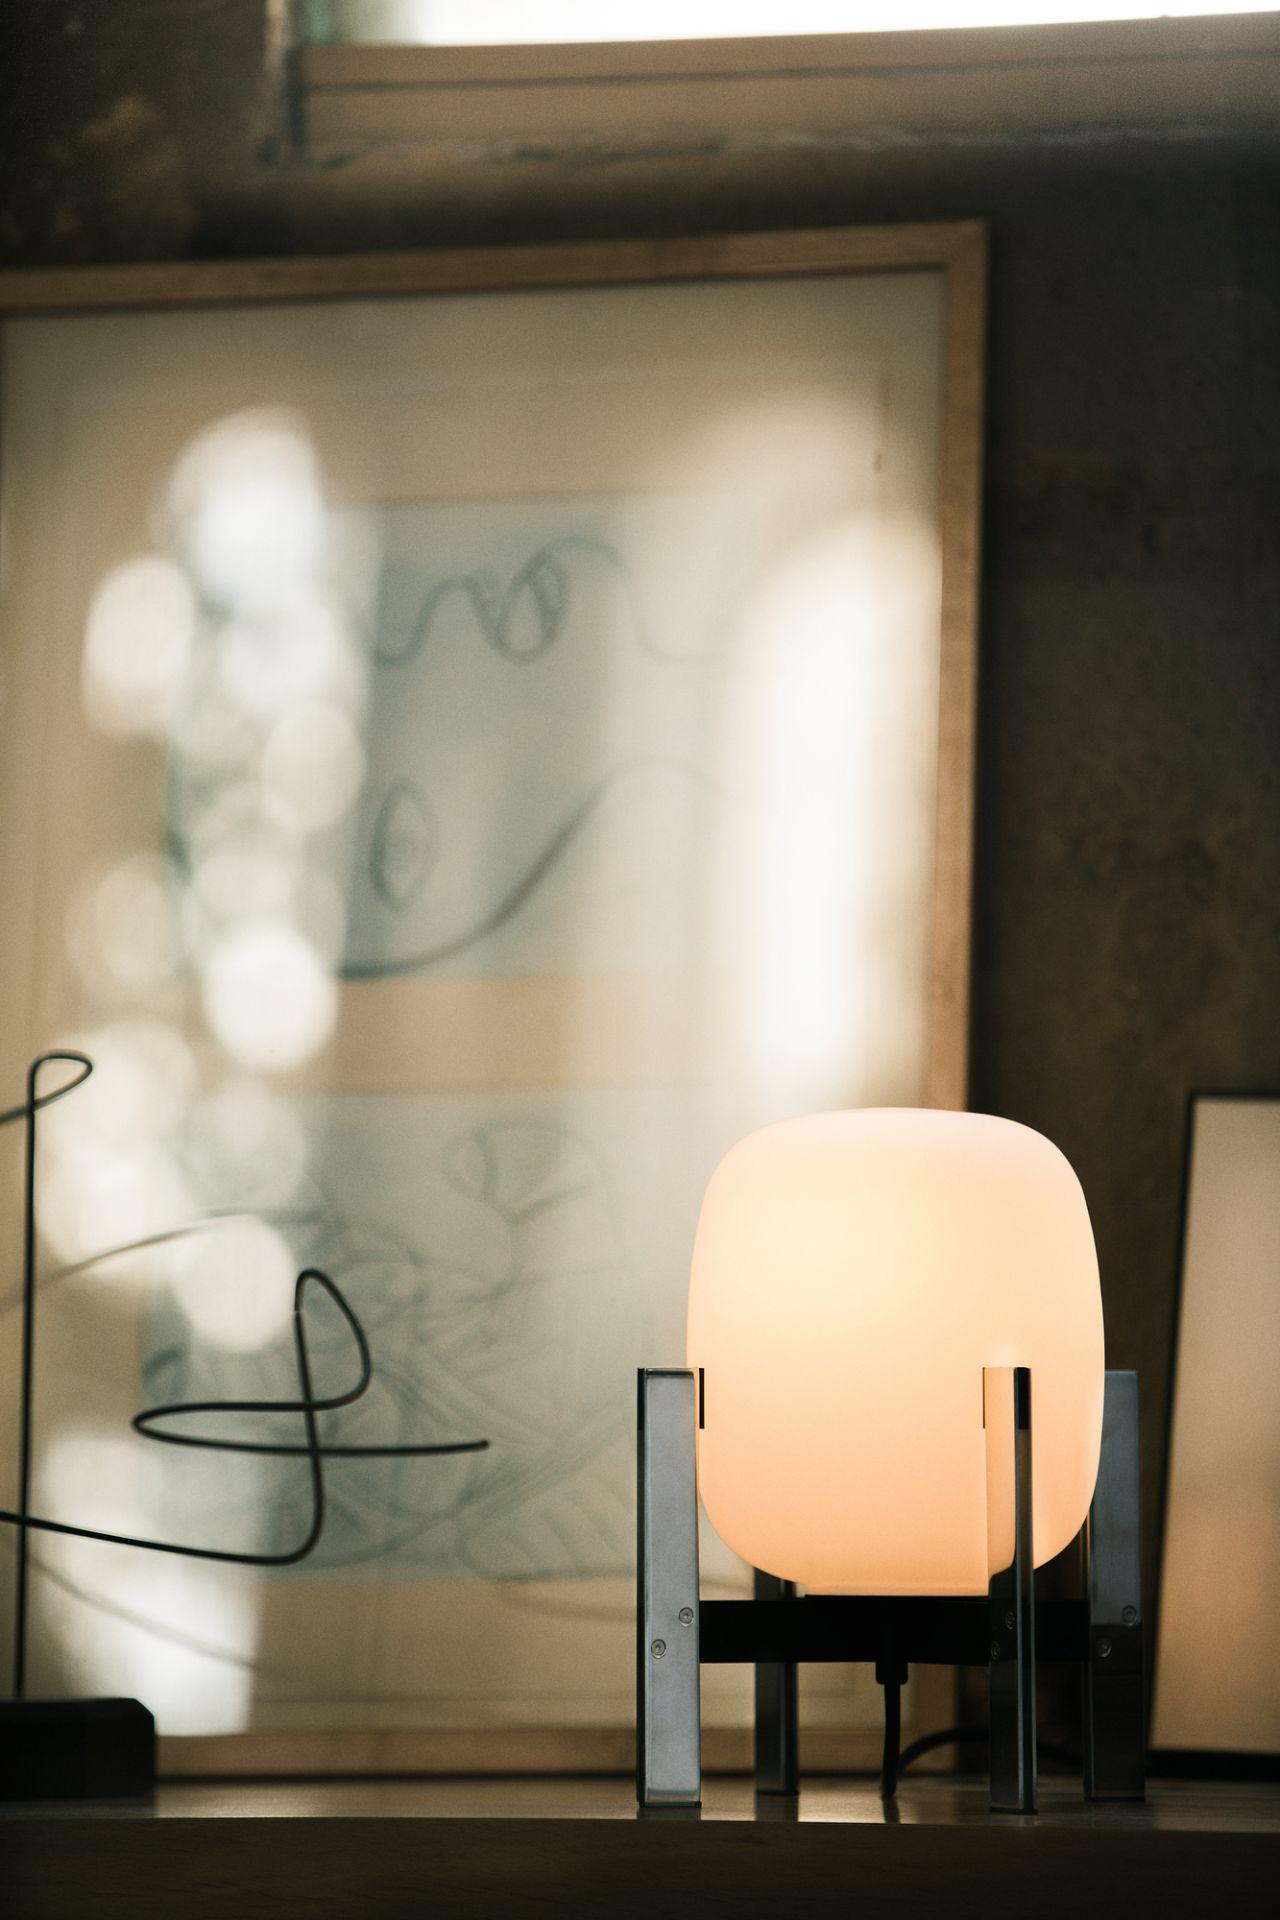 Cestita Metálica Table lamp / Table lantern Santa & Cole